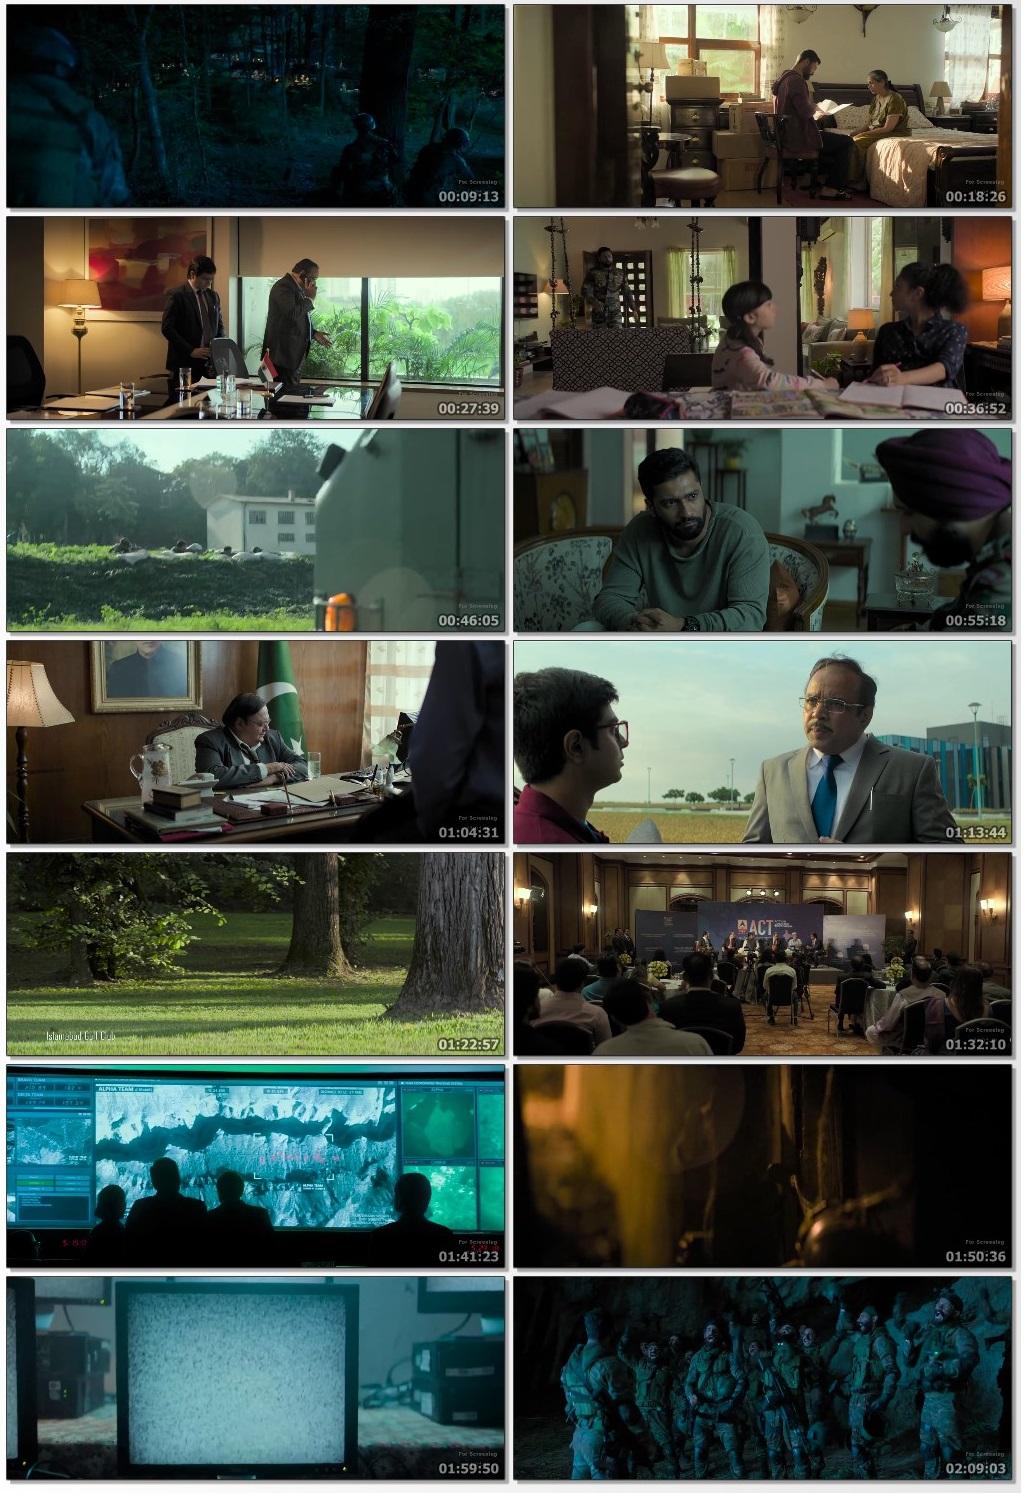 New Hindi Movei 2018 2019 Bolliwood: URI: The Surgical Strike (2019) Hindi 720p HDRip X264 1